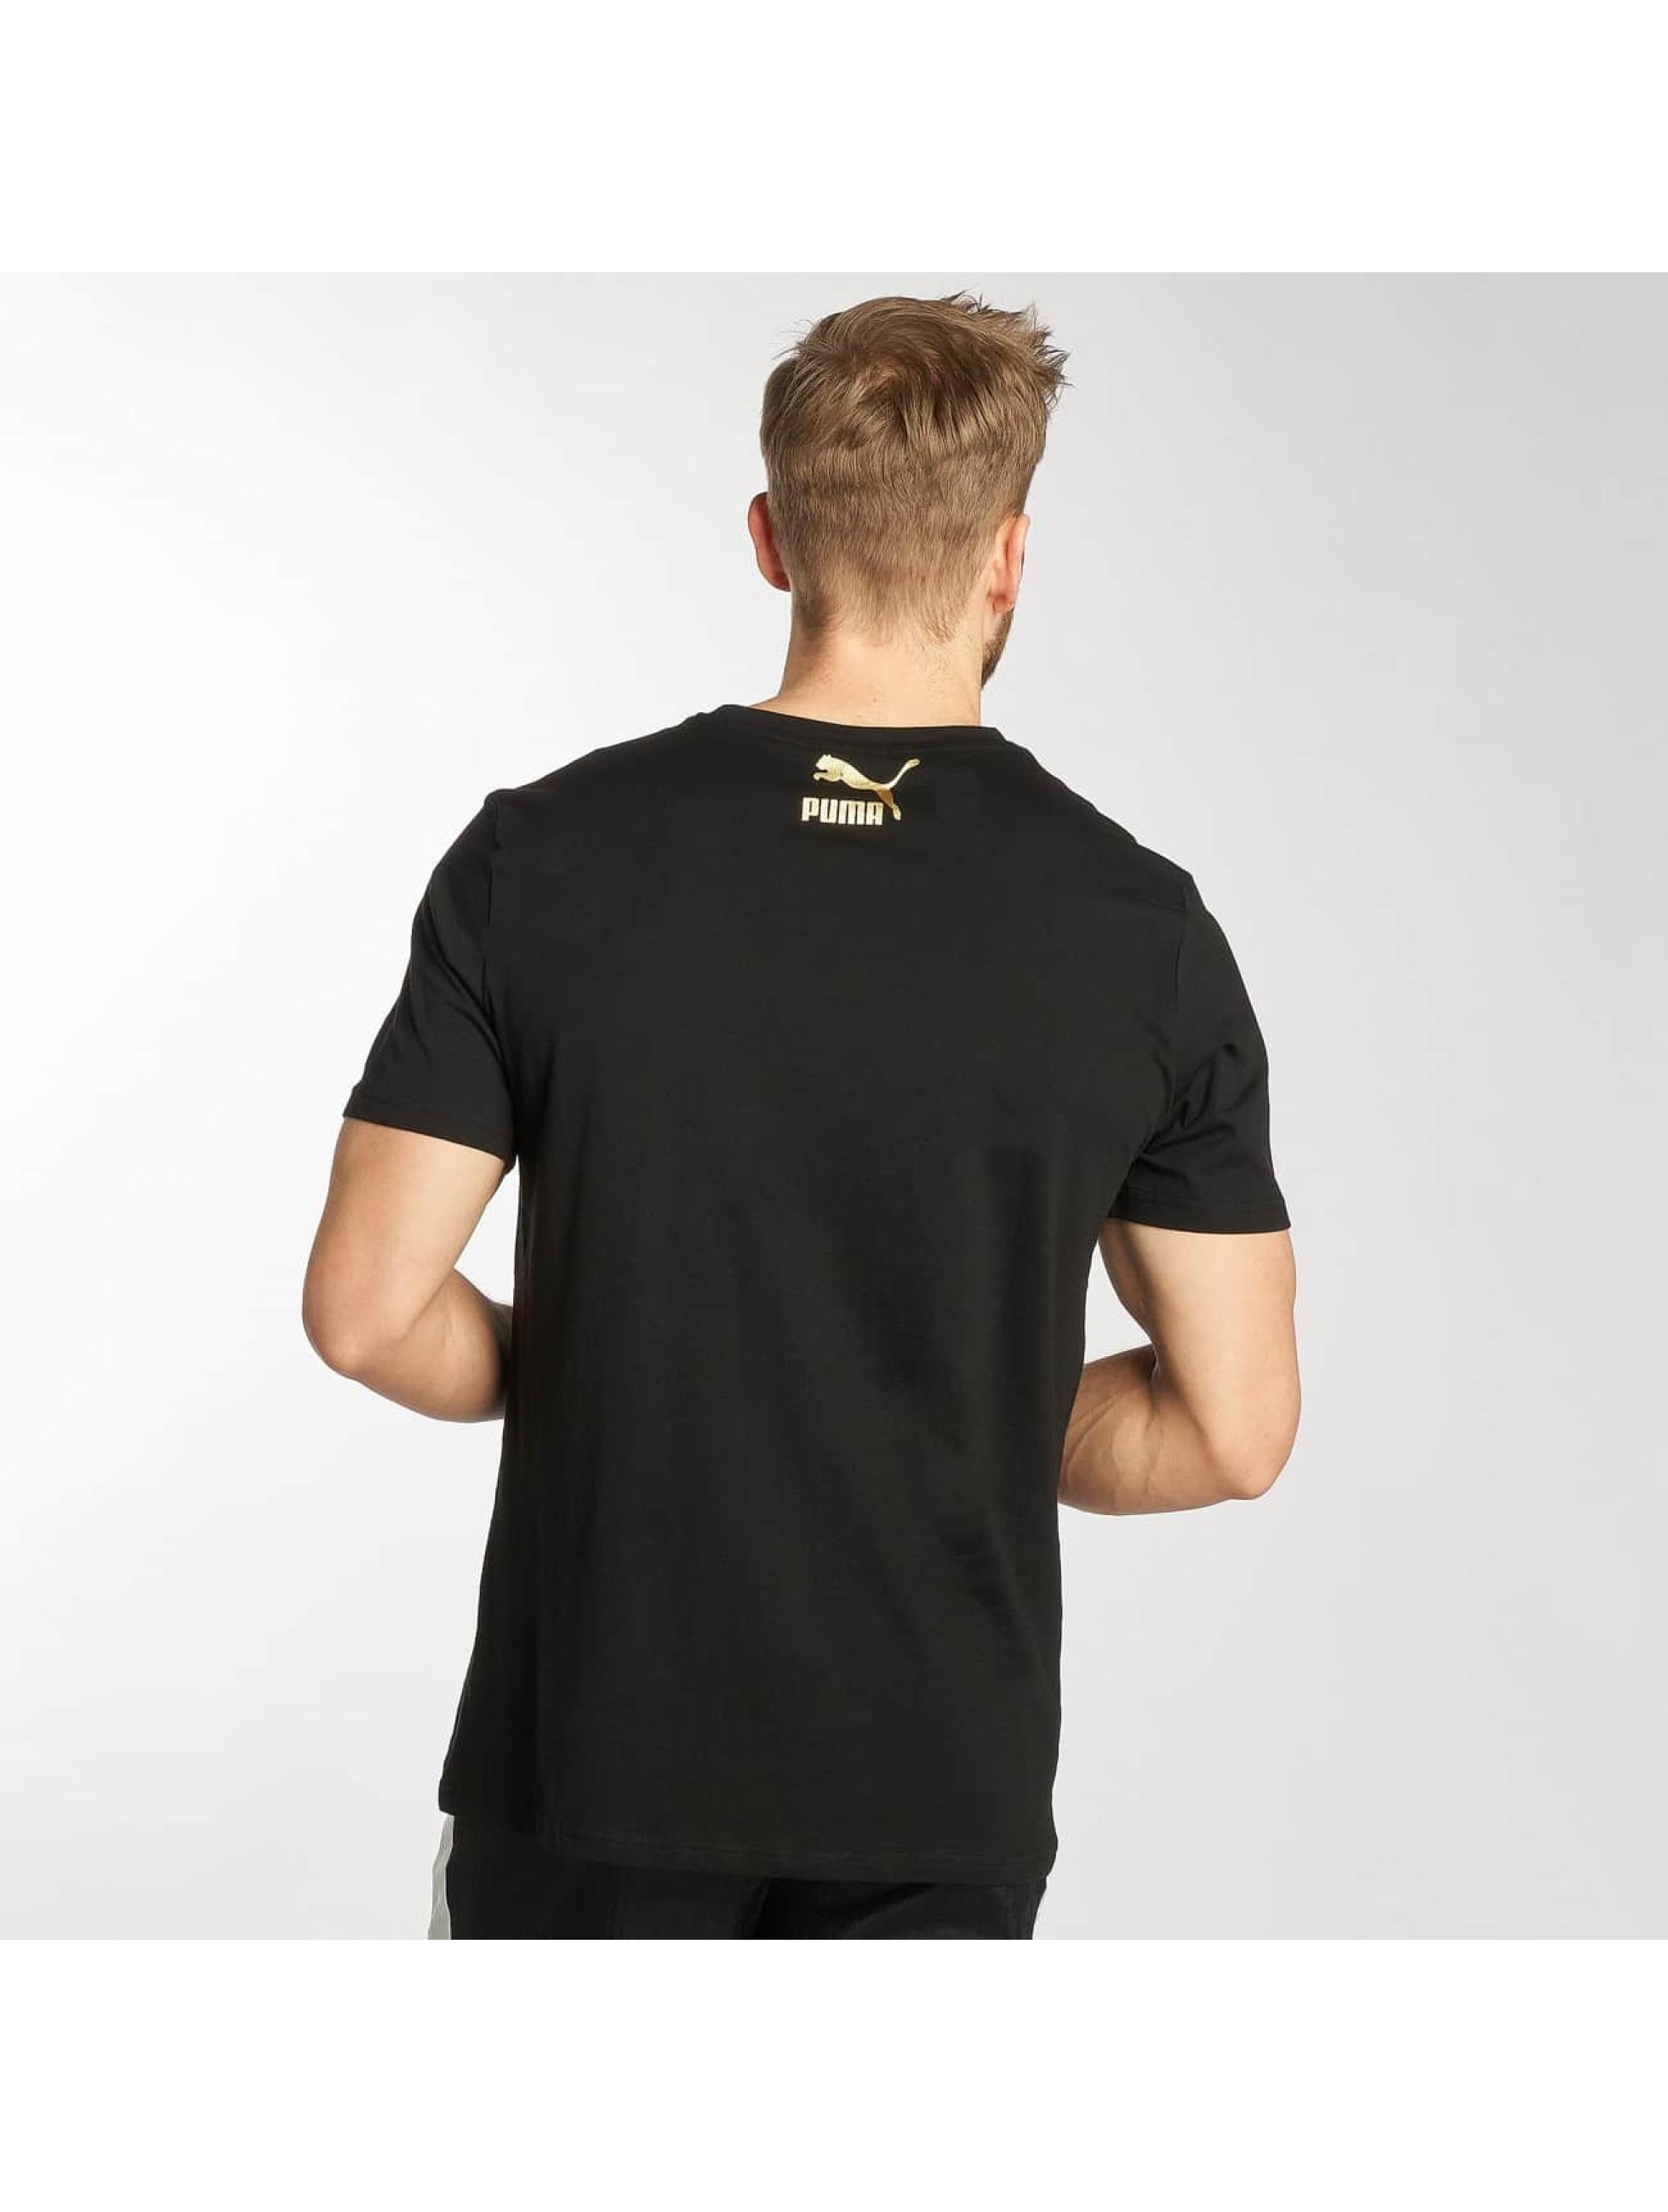 Puma t-shirt Suede zwart